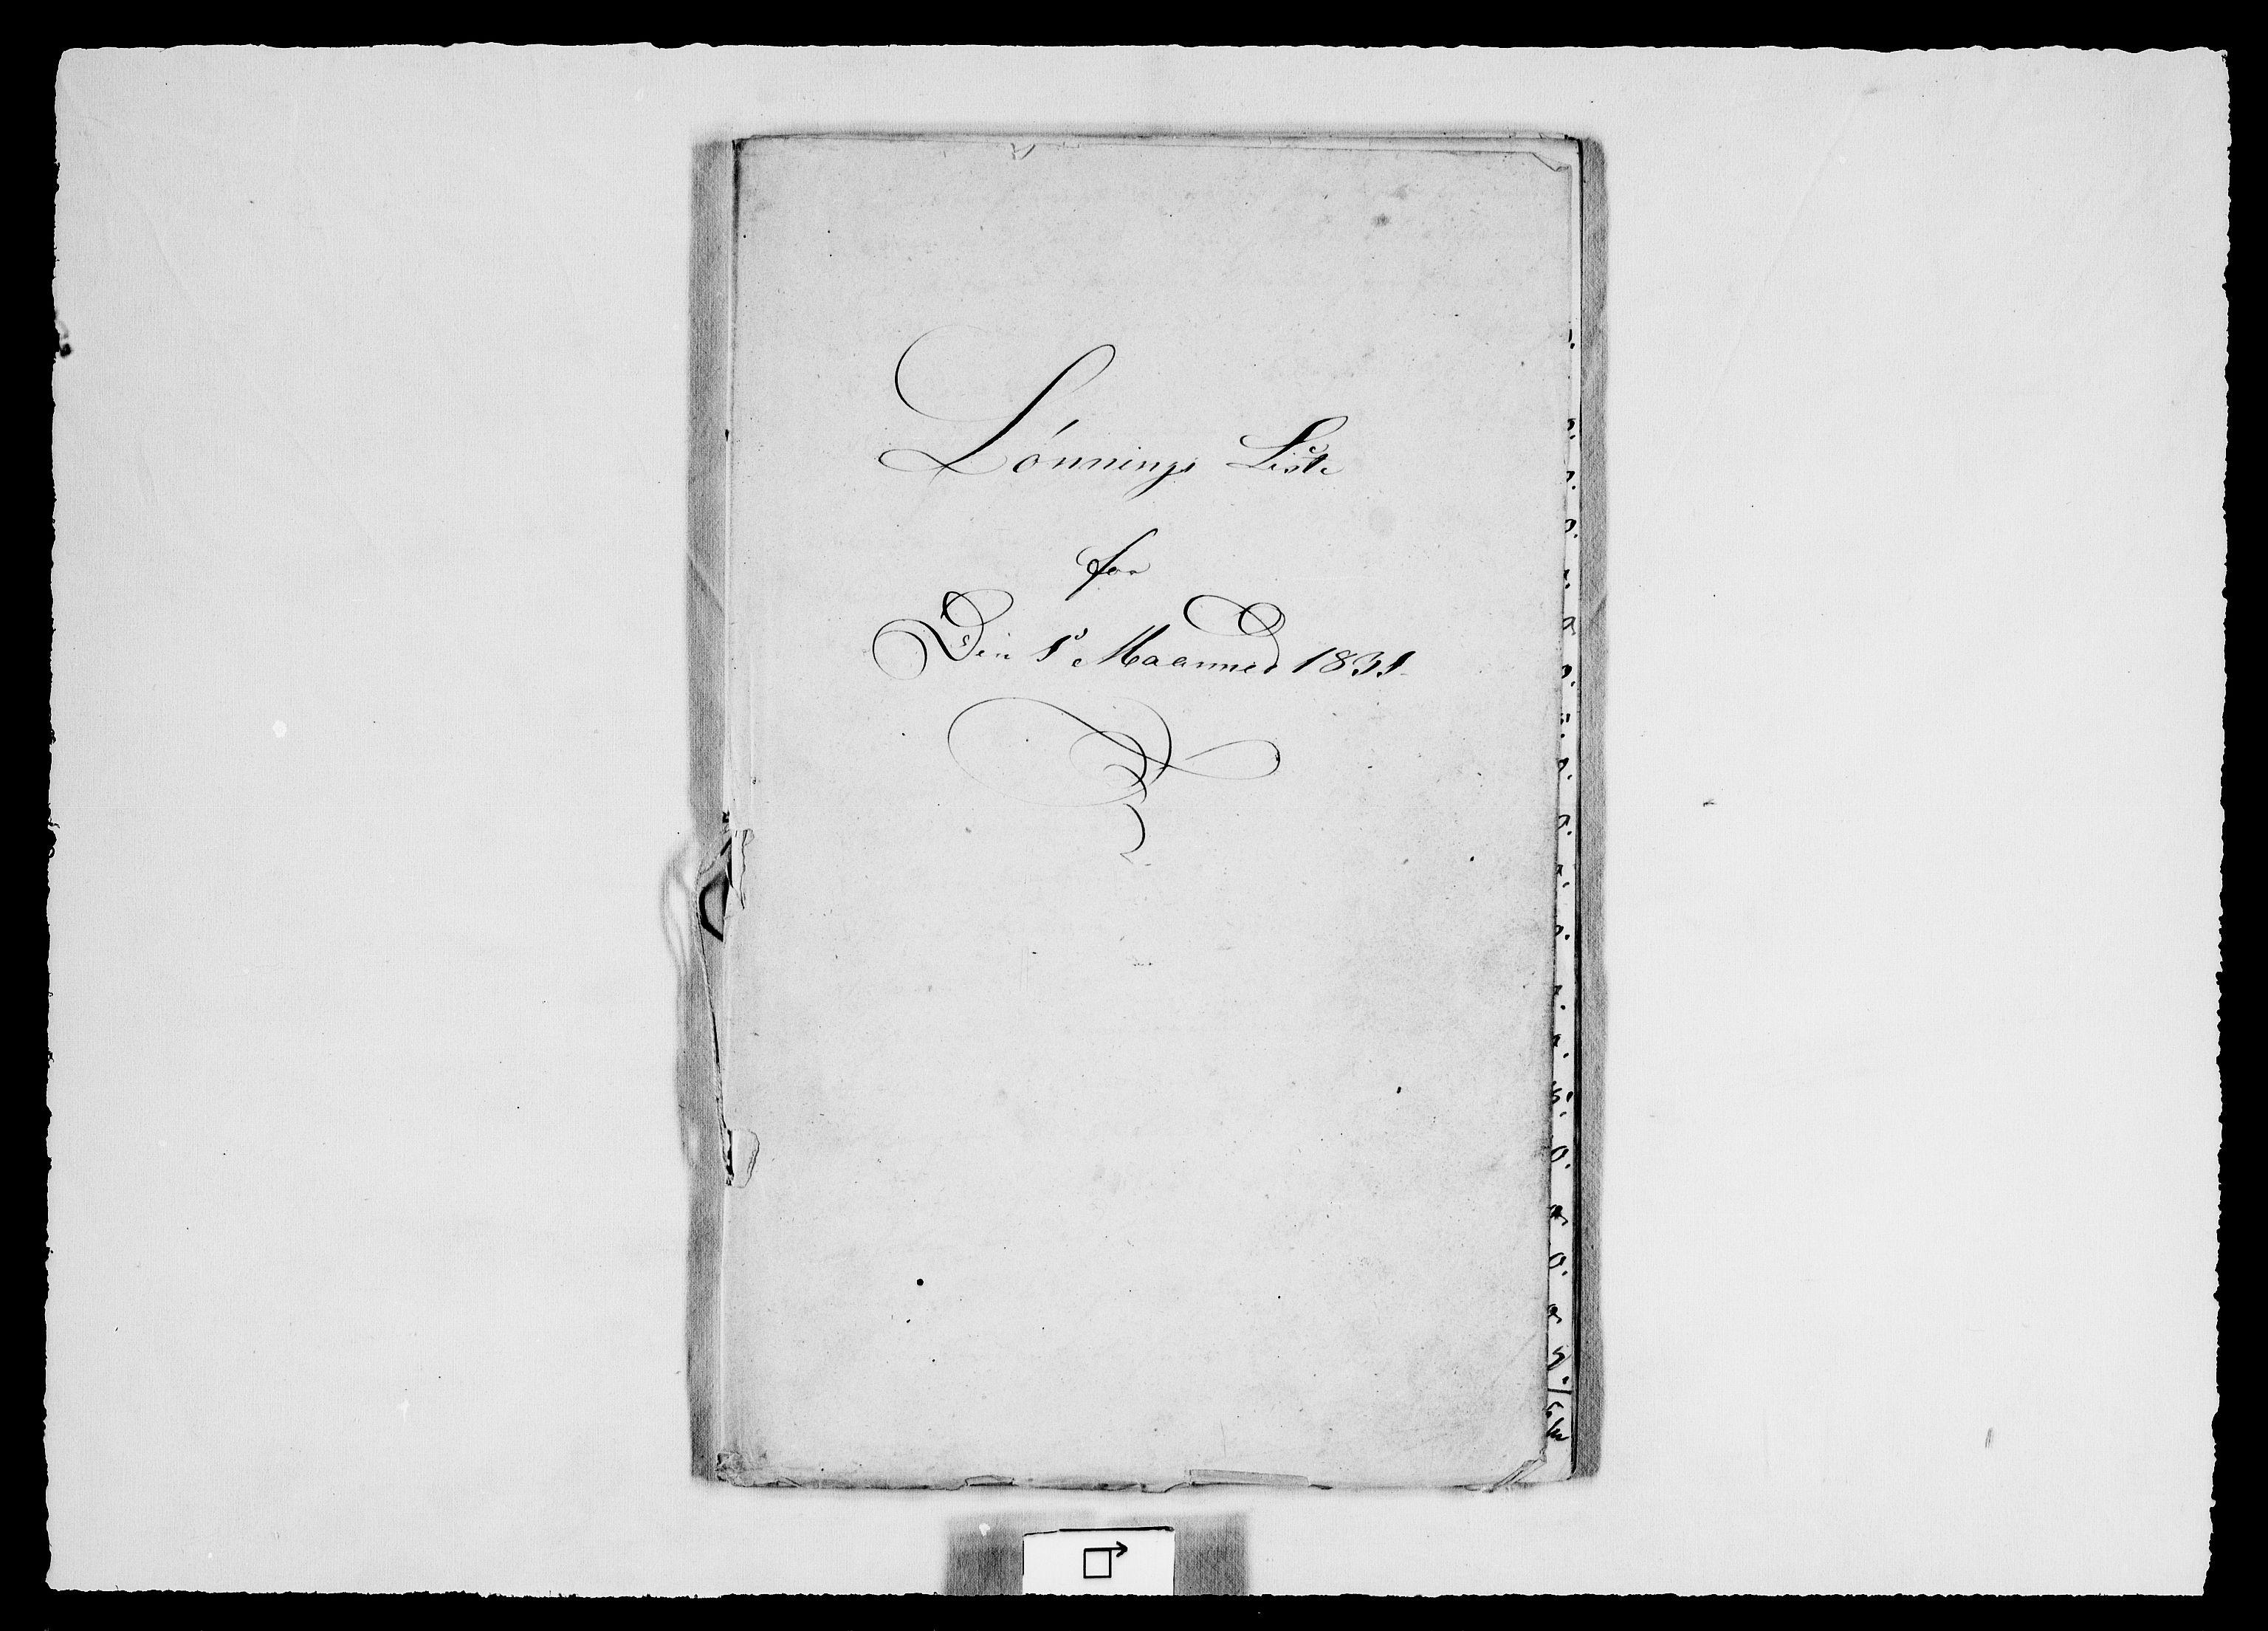 RA, Modums Blaafarveværk, G/Gd/Gdd/L0295, 1831, s. 2